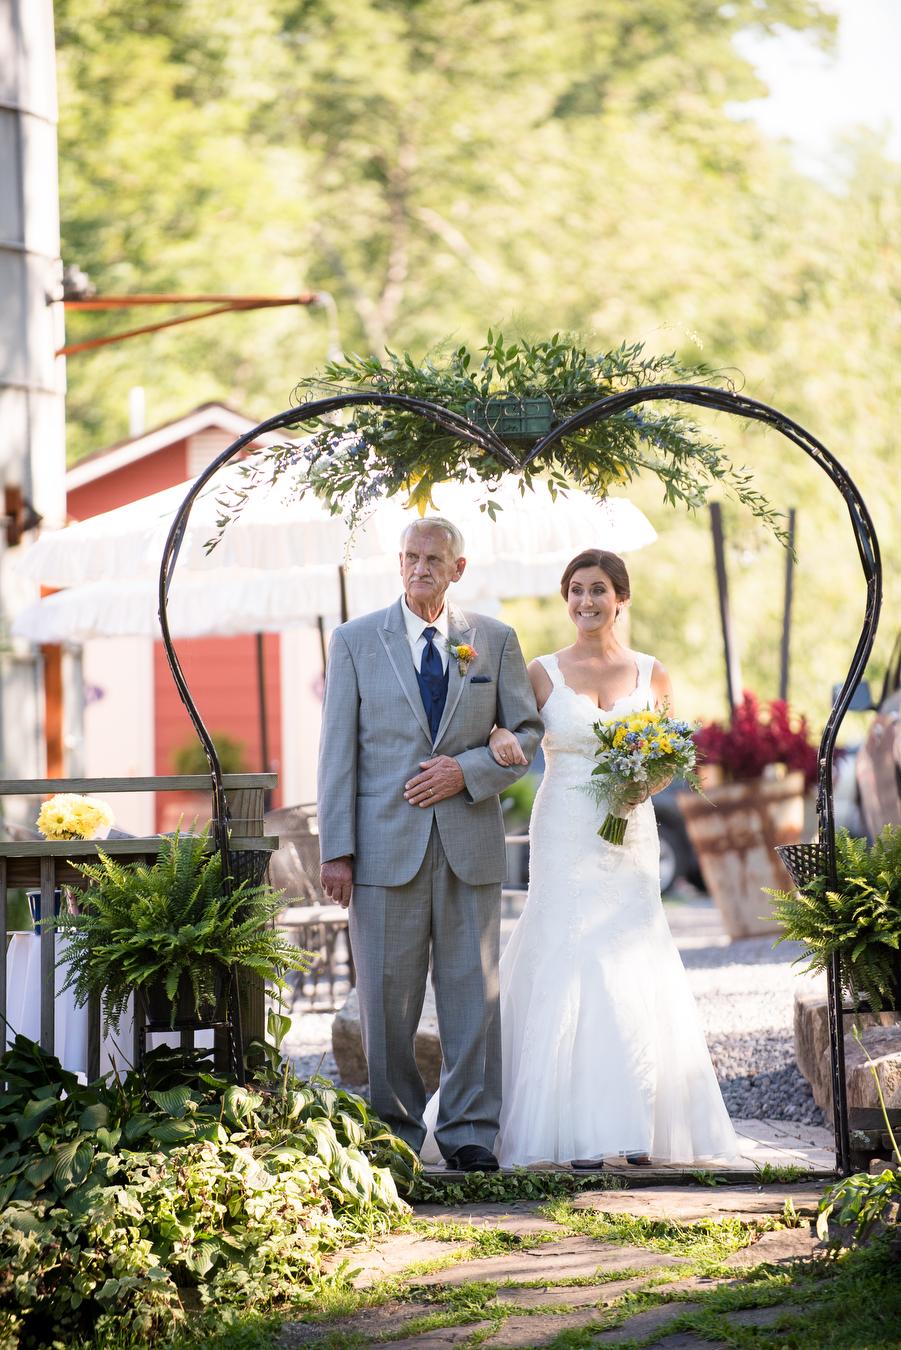 Karlo Gesner Photography Chanteclaire Farm Deep Creek Lake Lancaster Philadelphia Wedding Photographer 0025.JPG